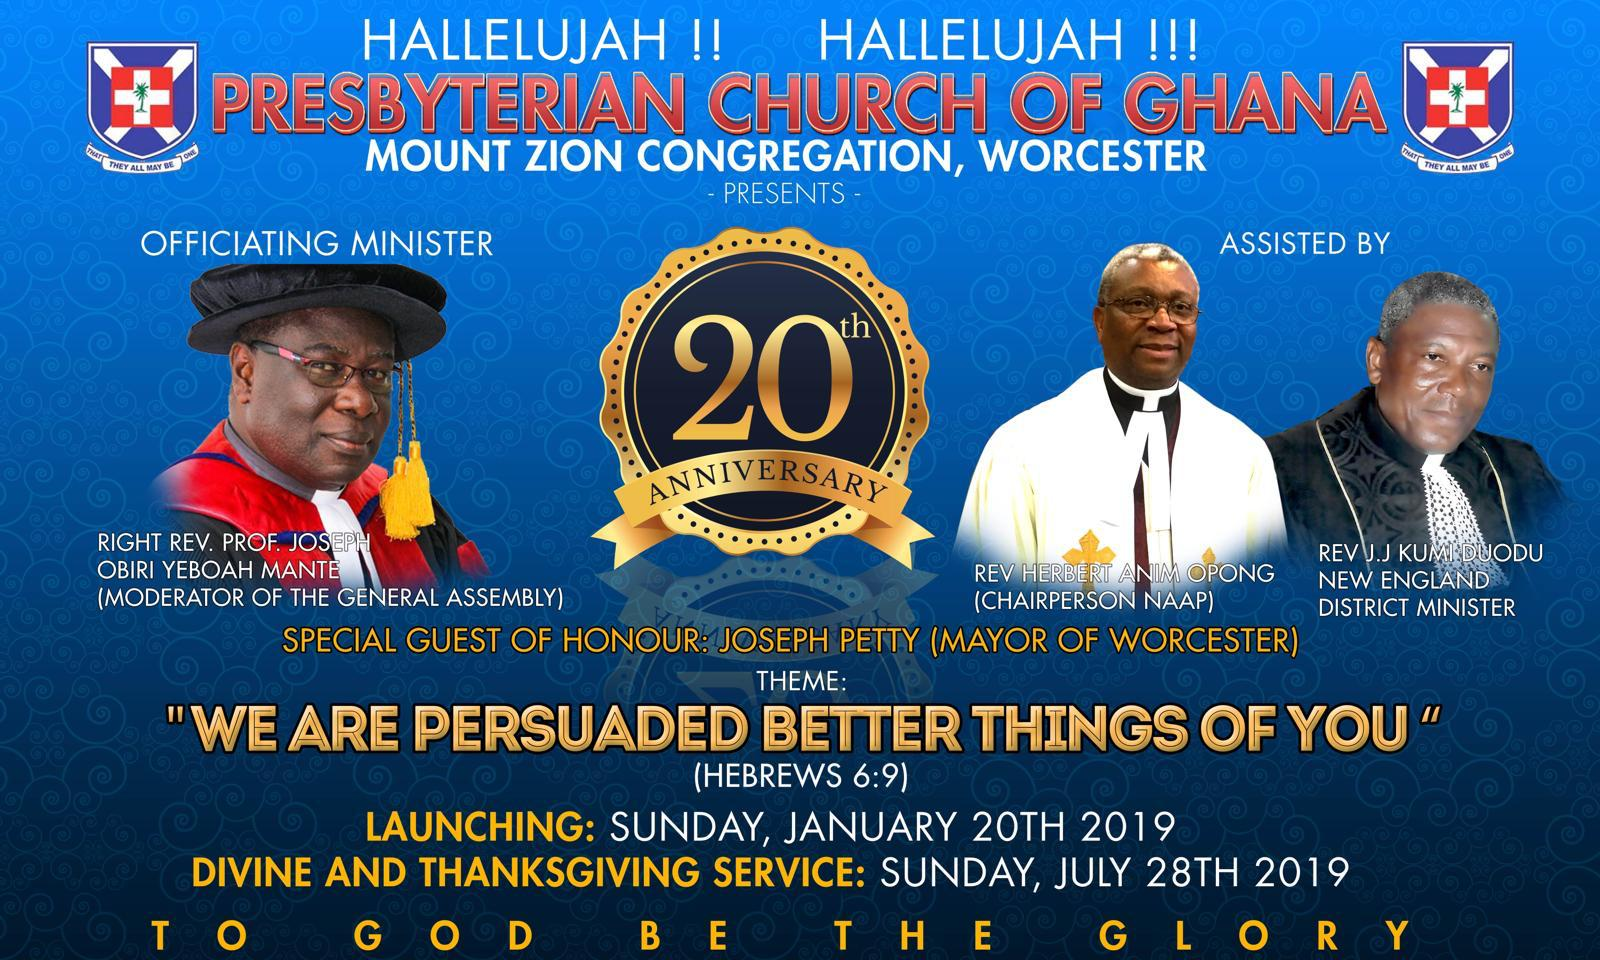 PCG-Mount Zion Congregation's 20th Anniversary Celebration